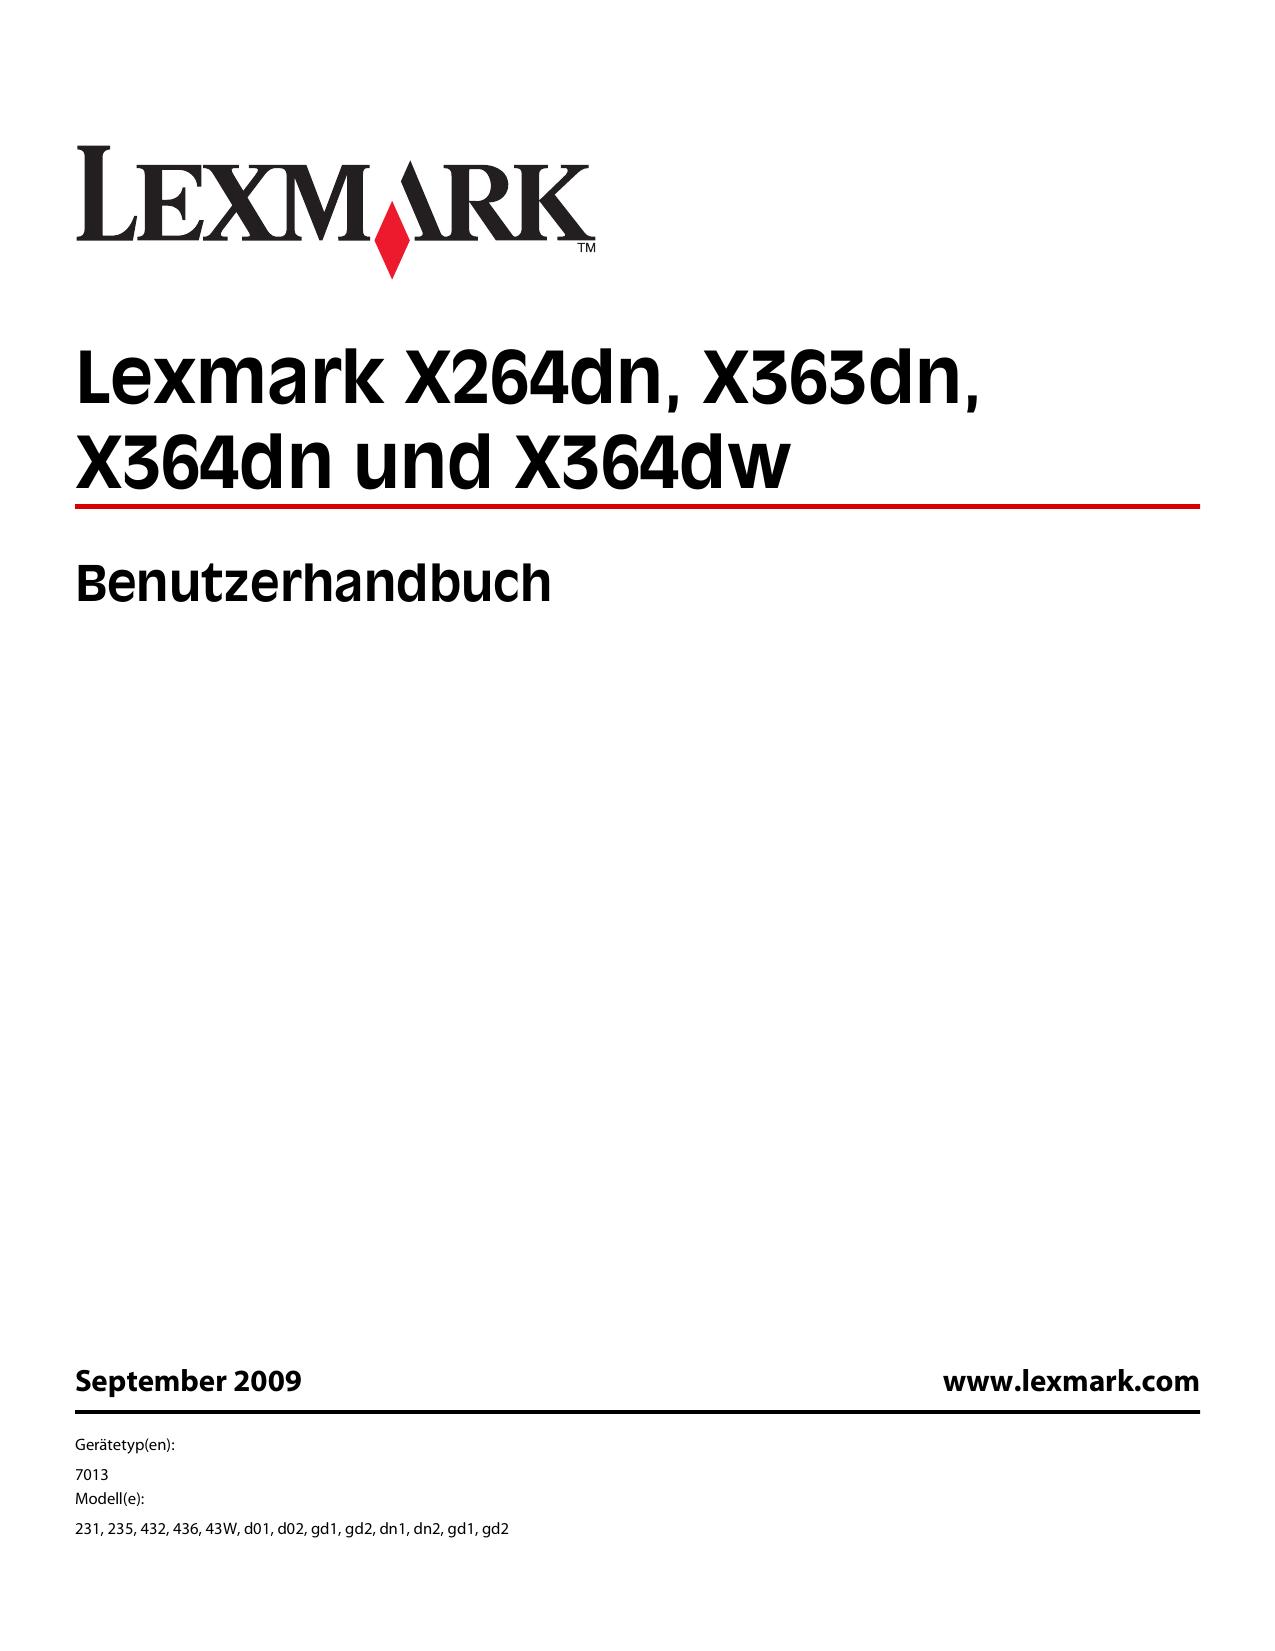 Lexmark X264dn X363dn X364dn und X364dw